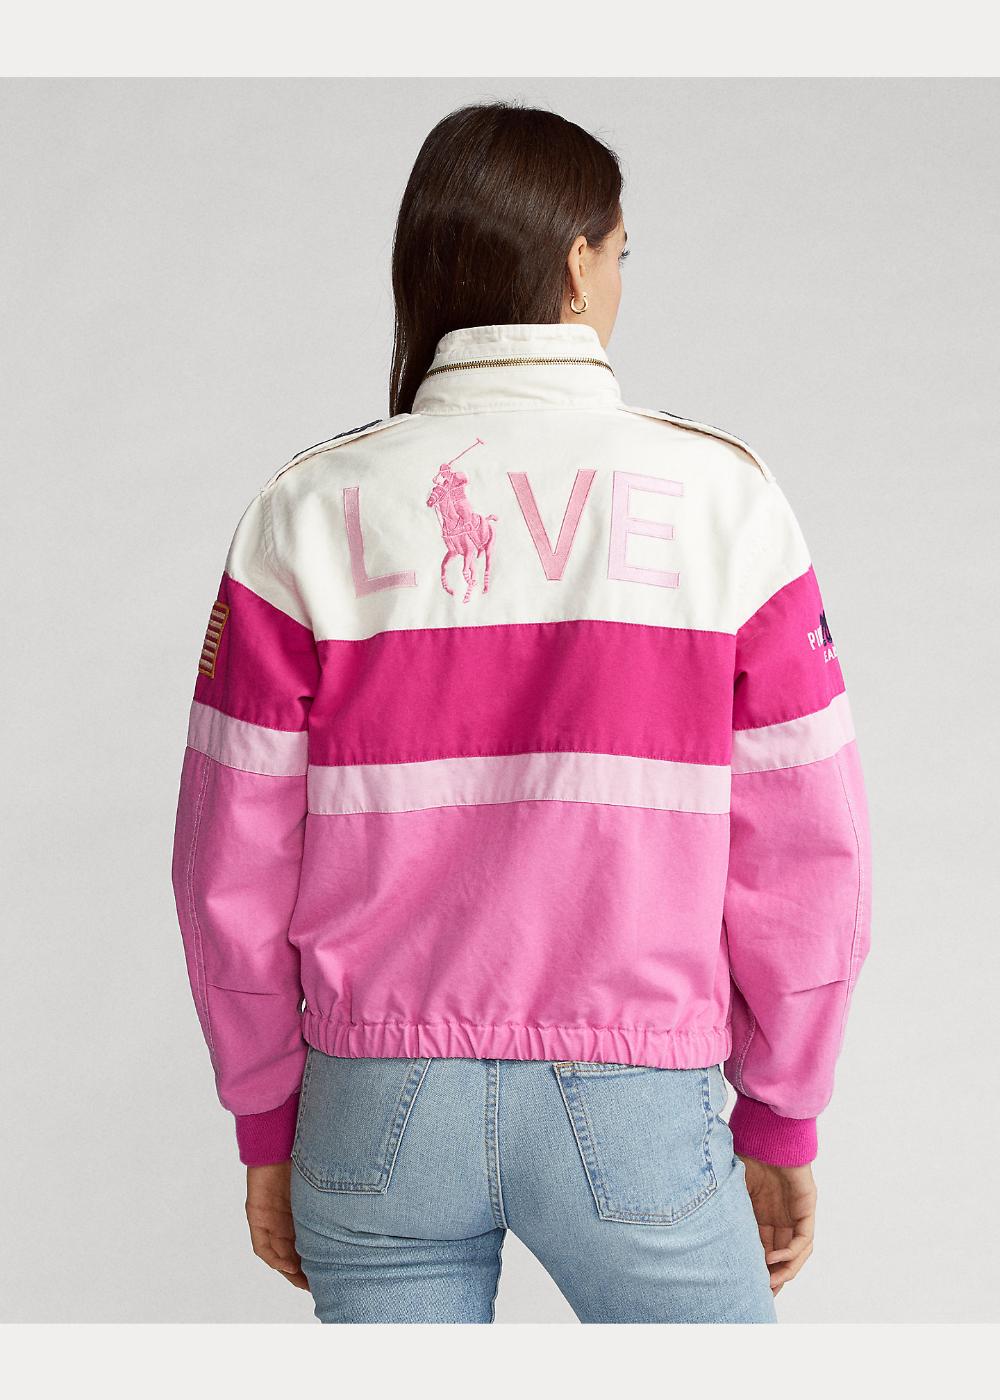 Pink Pony Cotton Canvas Bomber Jacket Jackets Bomber Jacket Cotton Canvas [ 1400 x 1000 Pixel ]